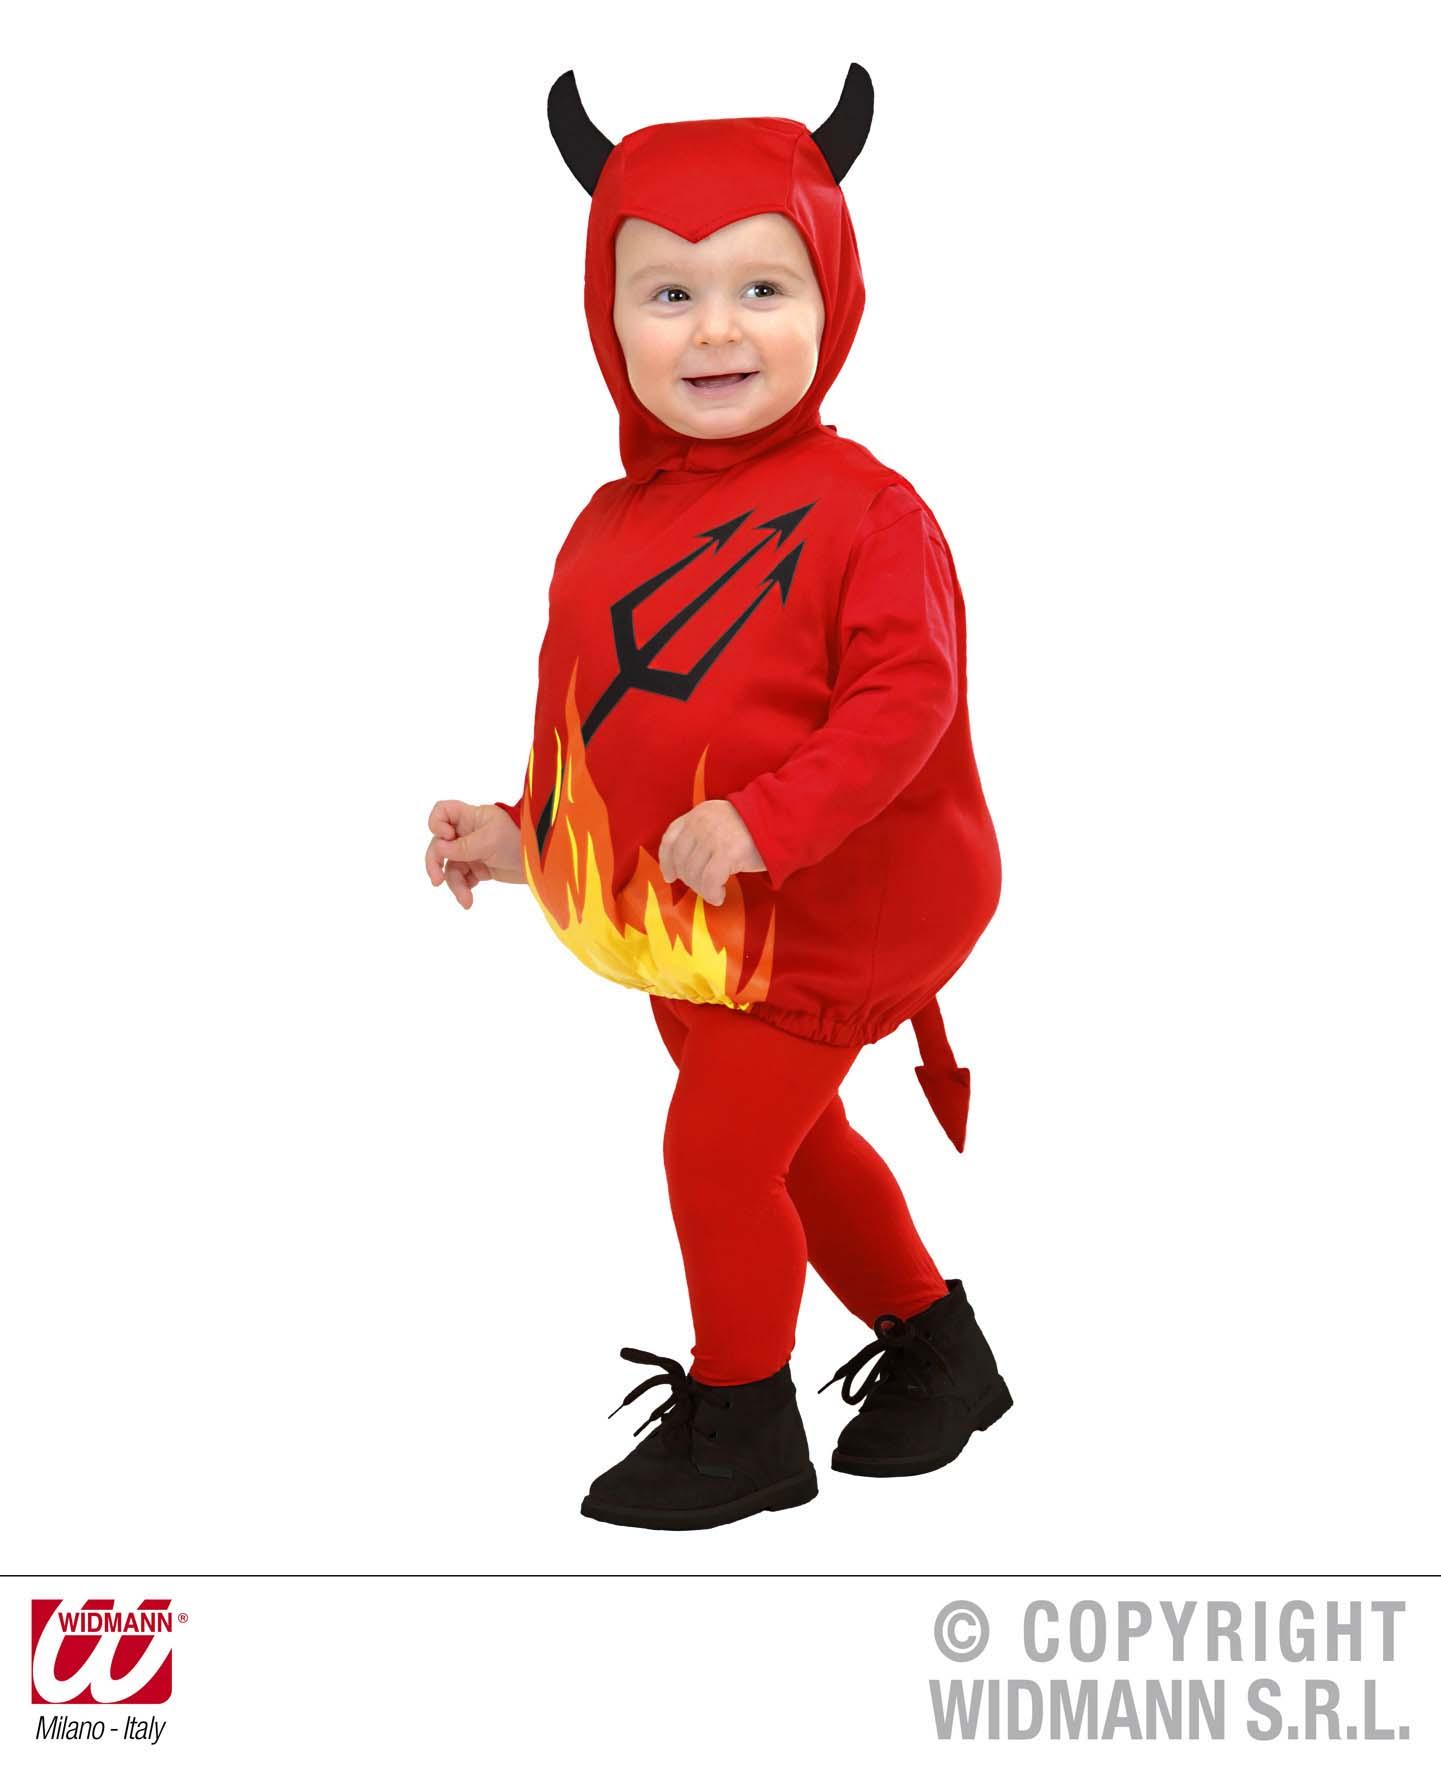 2 tlg. Kostüm Teufel, Kinder Kleinkinder 80-86, 1-2 Jahre,Karneval 1897